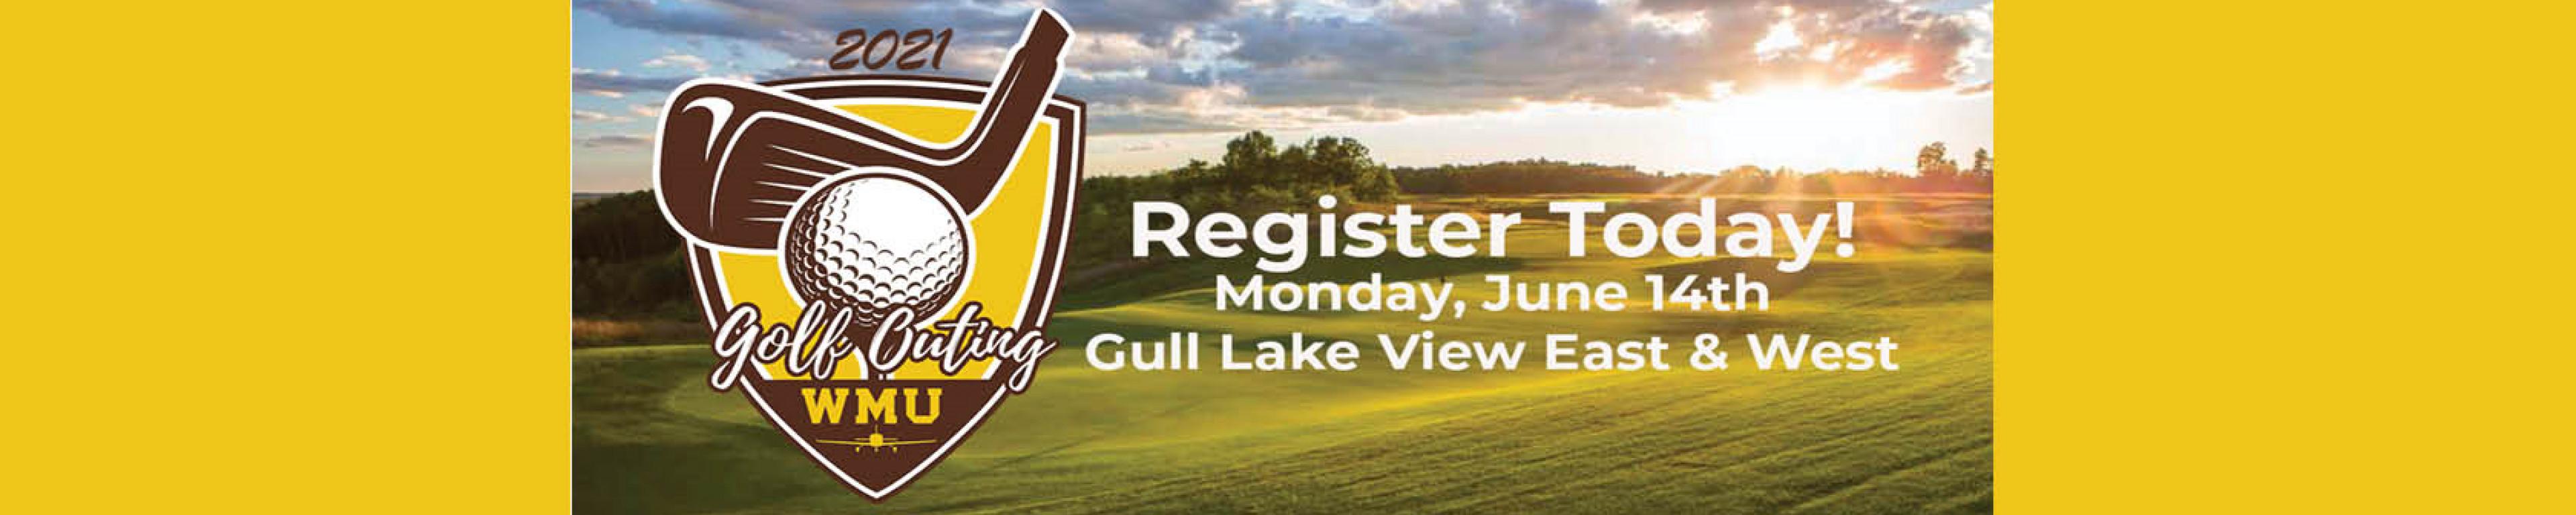 WMU Aviation Golf Outing June 14, 2021